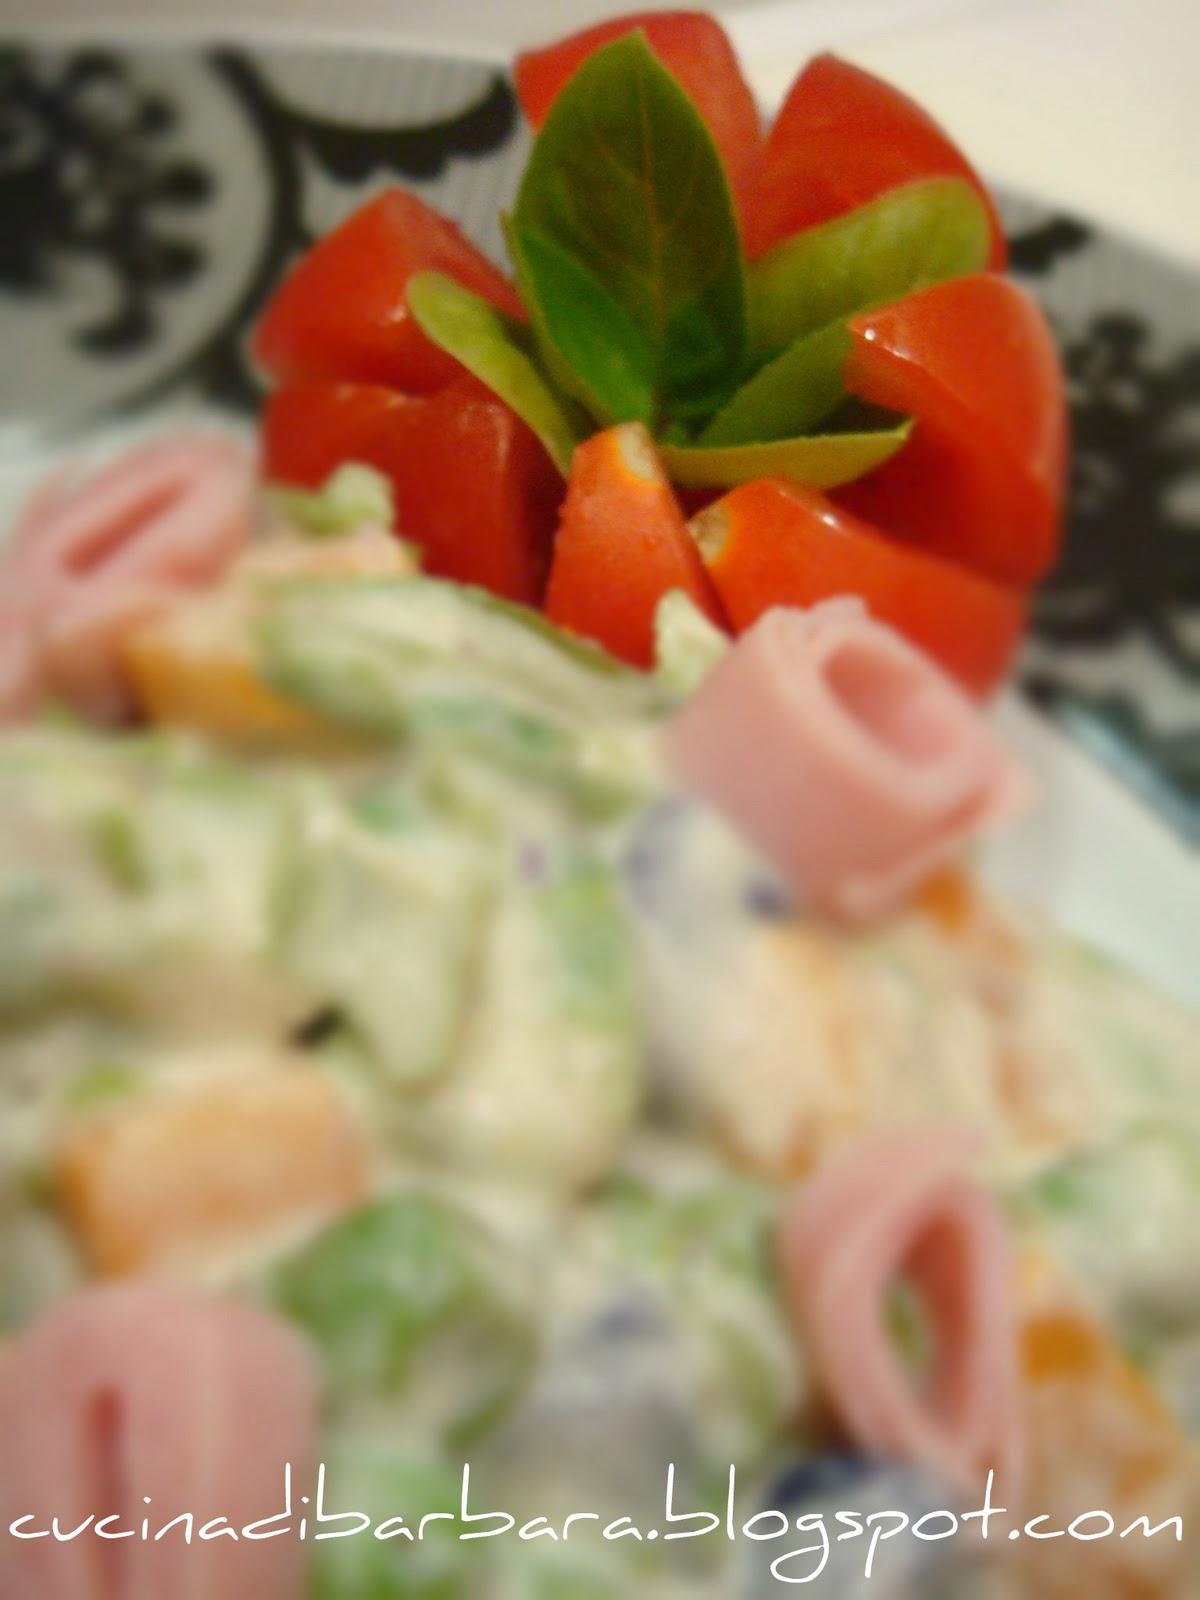 Ricetta Insalata Russa Pentola A Pressione.Cucina Di Barbara Food Blog Blog Di Cucina Ricette Ricetta Insalata Russa Olivier Salad